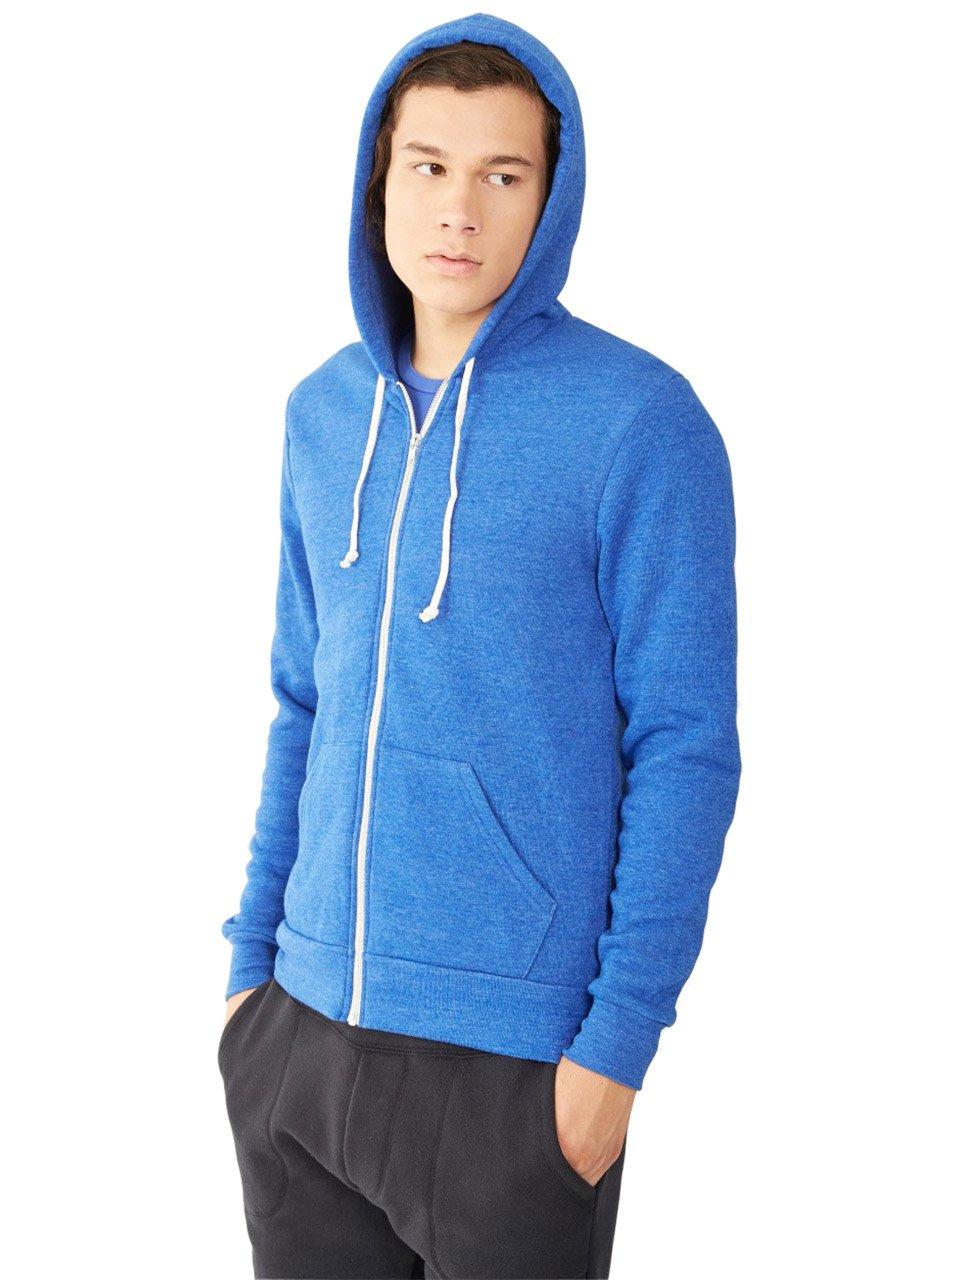 Alternative Mens Rocky Eco-Fleece Zip Hoodie X-Small Eco True Pacific Blue by Alternative